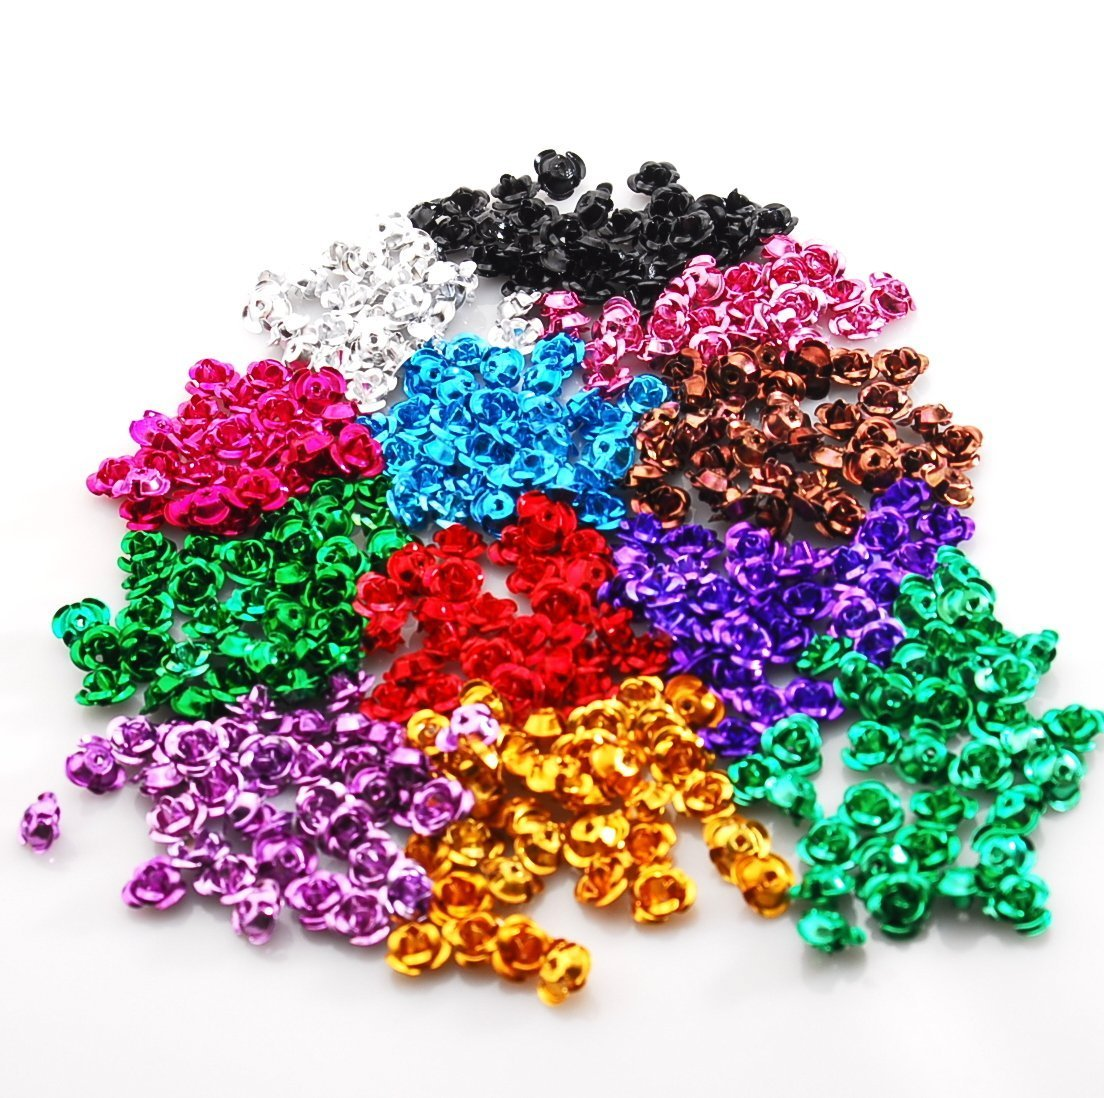 Resin / Nail / Beading Parts Material - 6 mm Aluminium Rose 12 Farbes (360 Pieces)